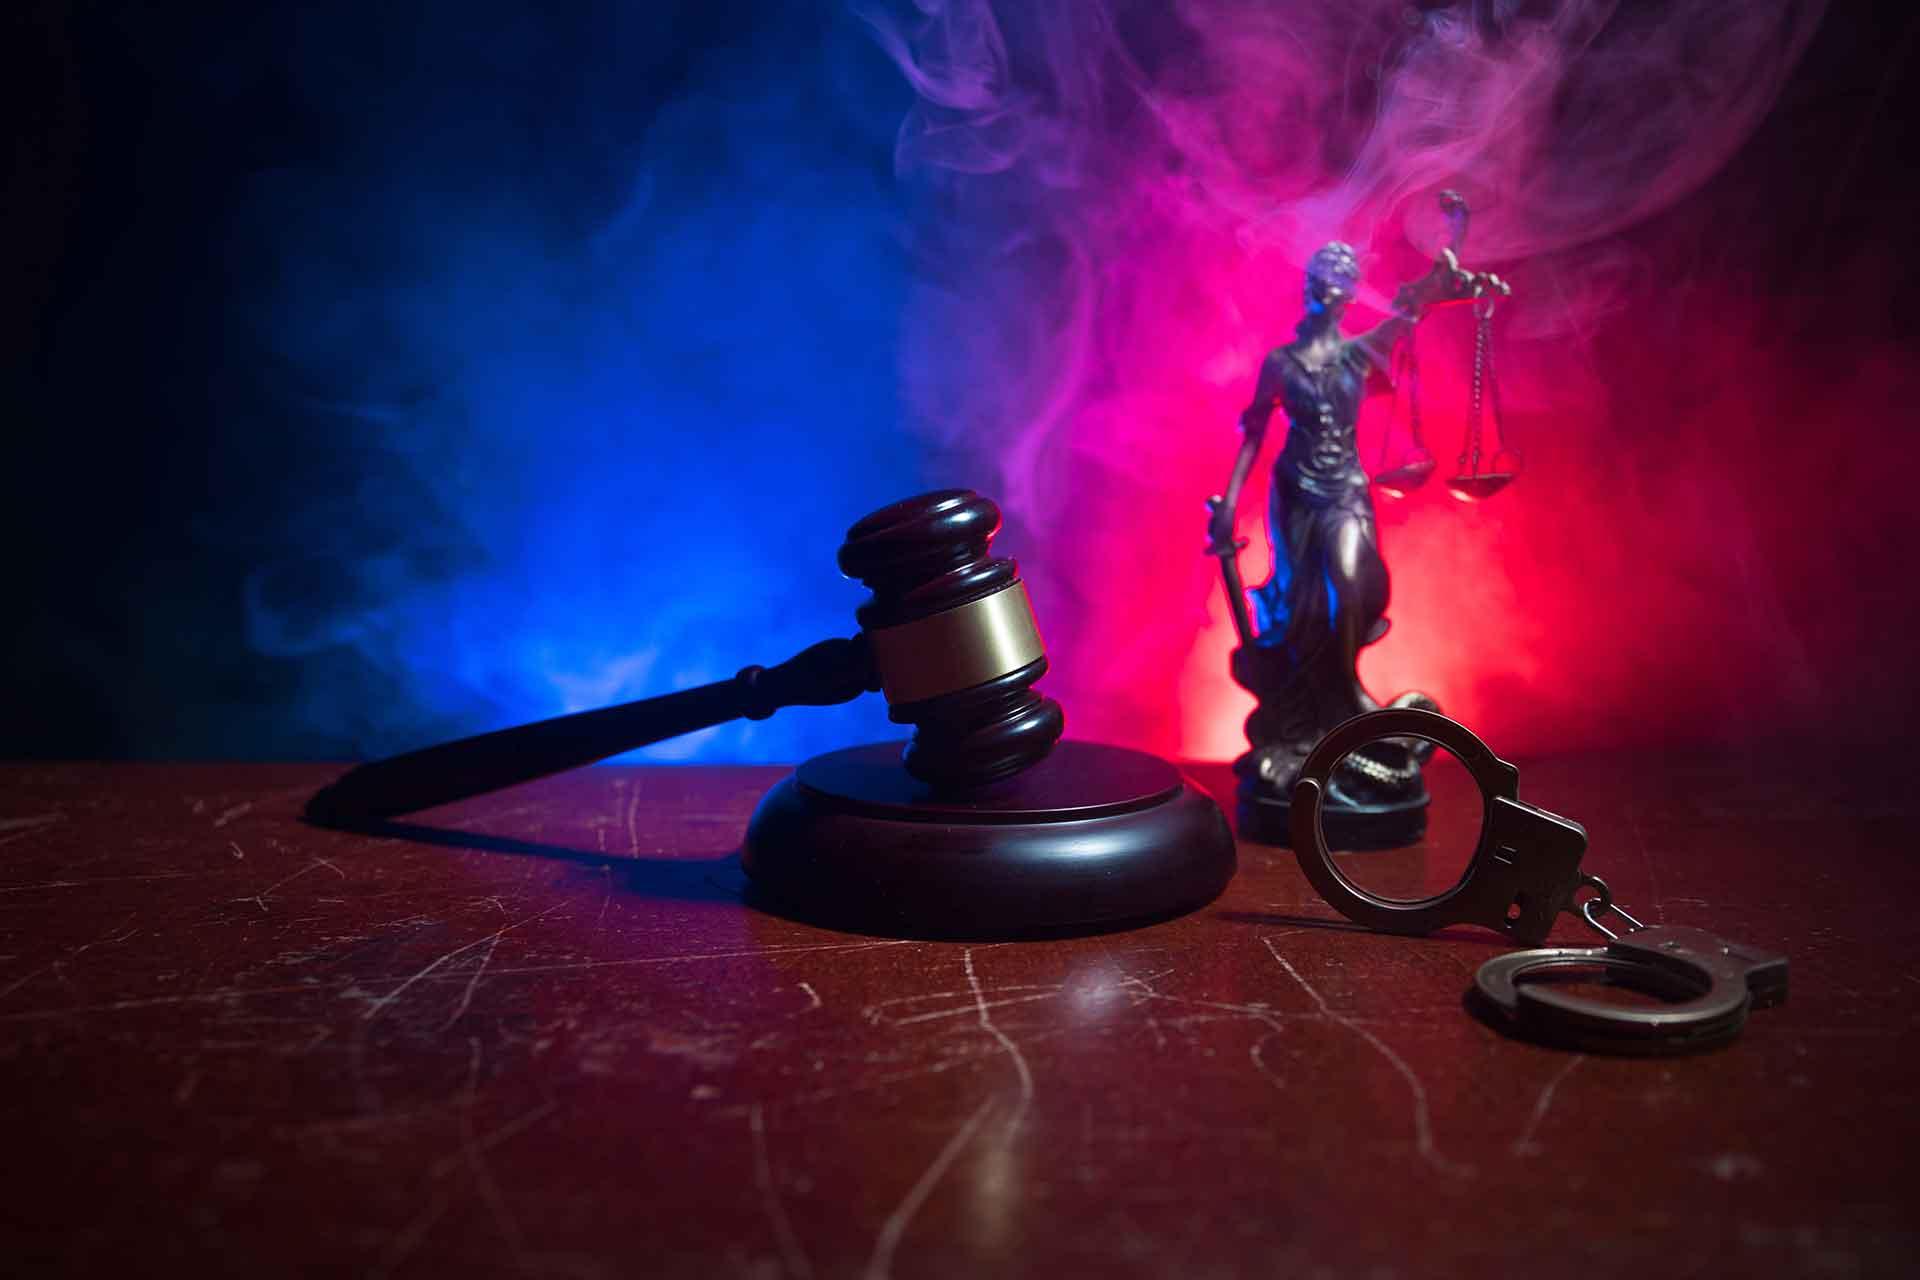 Politierechter strafrecht advocaat - Weening Strafrechtadvocaten